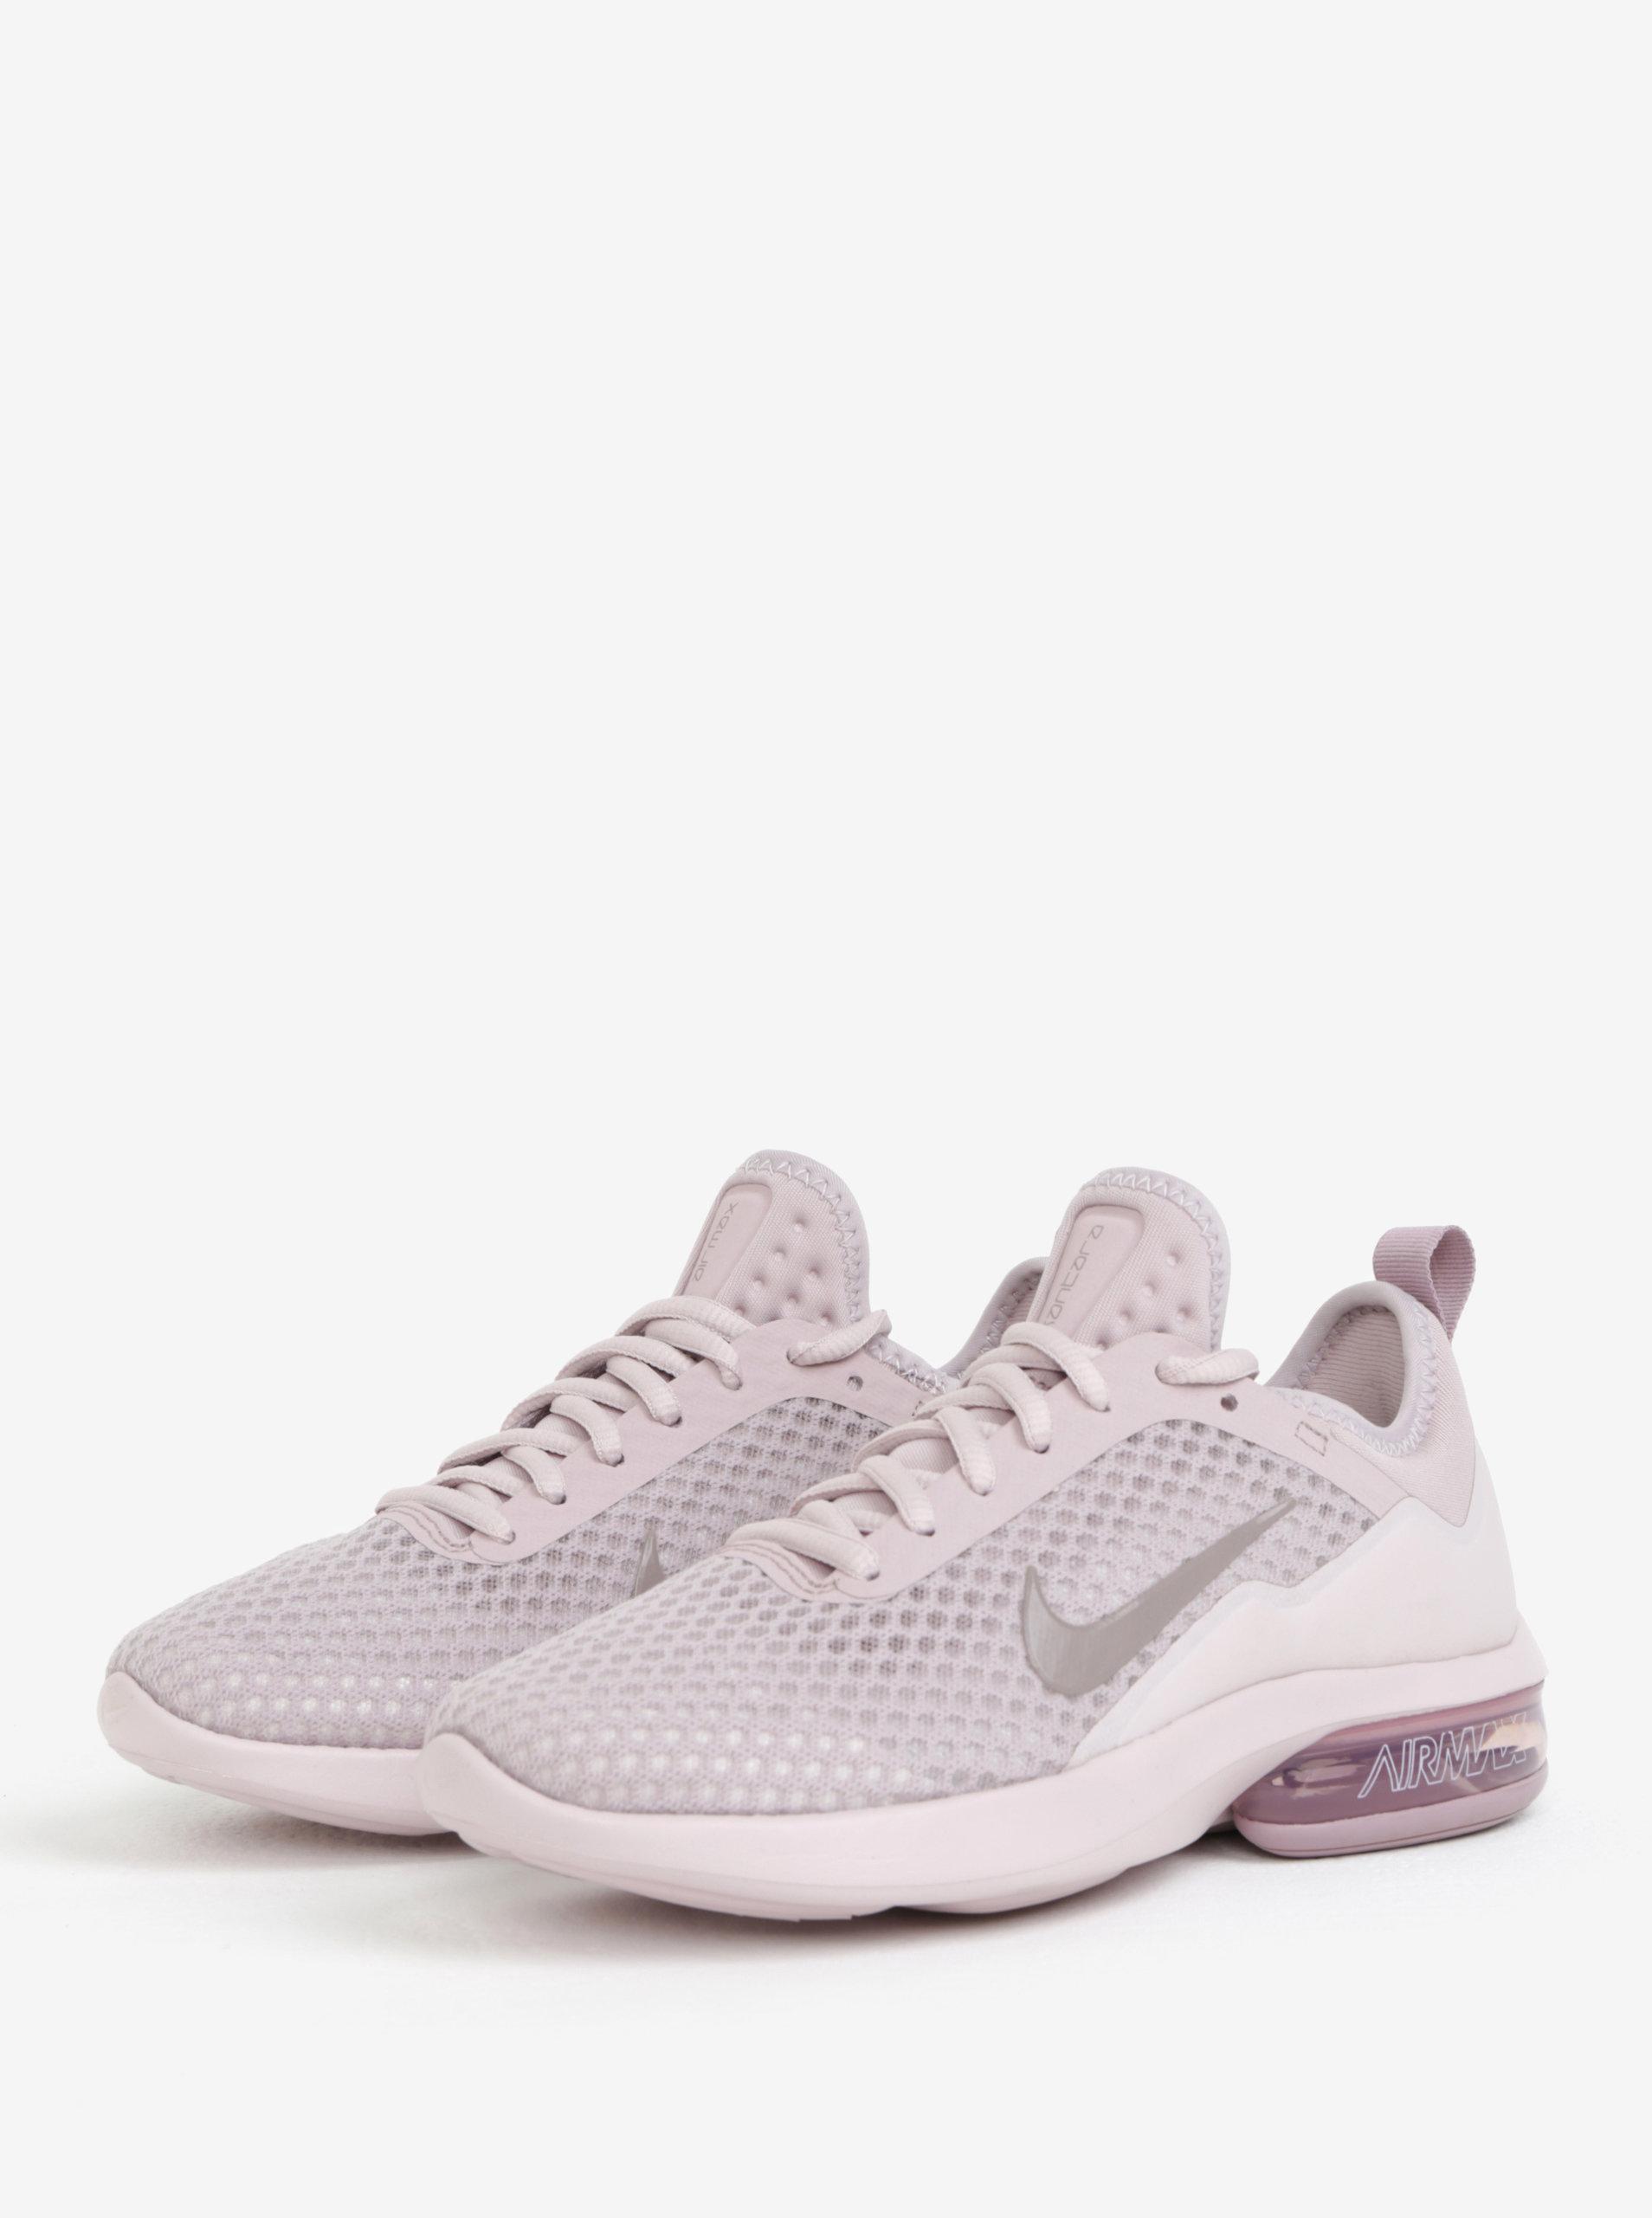 Světle fialové dámské tenisky Nike Air Max Kantara Running ... b0603c779a0